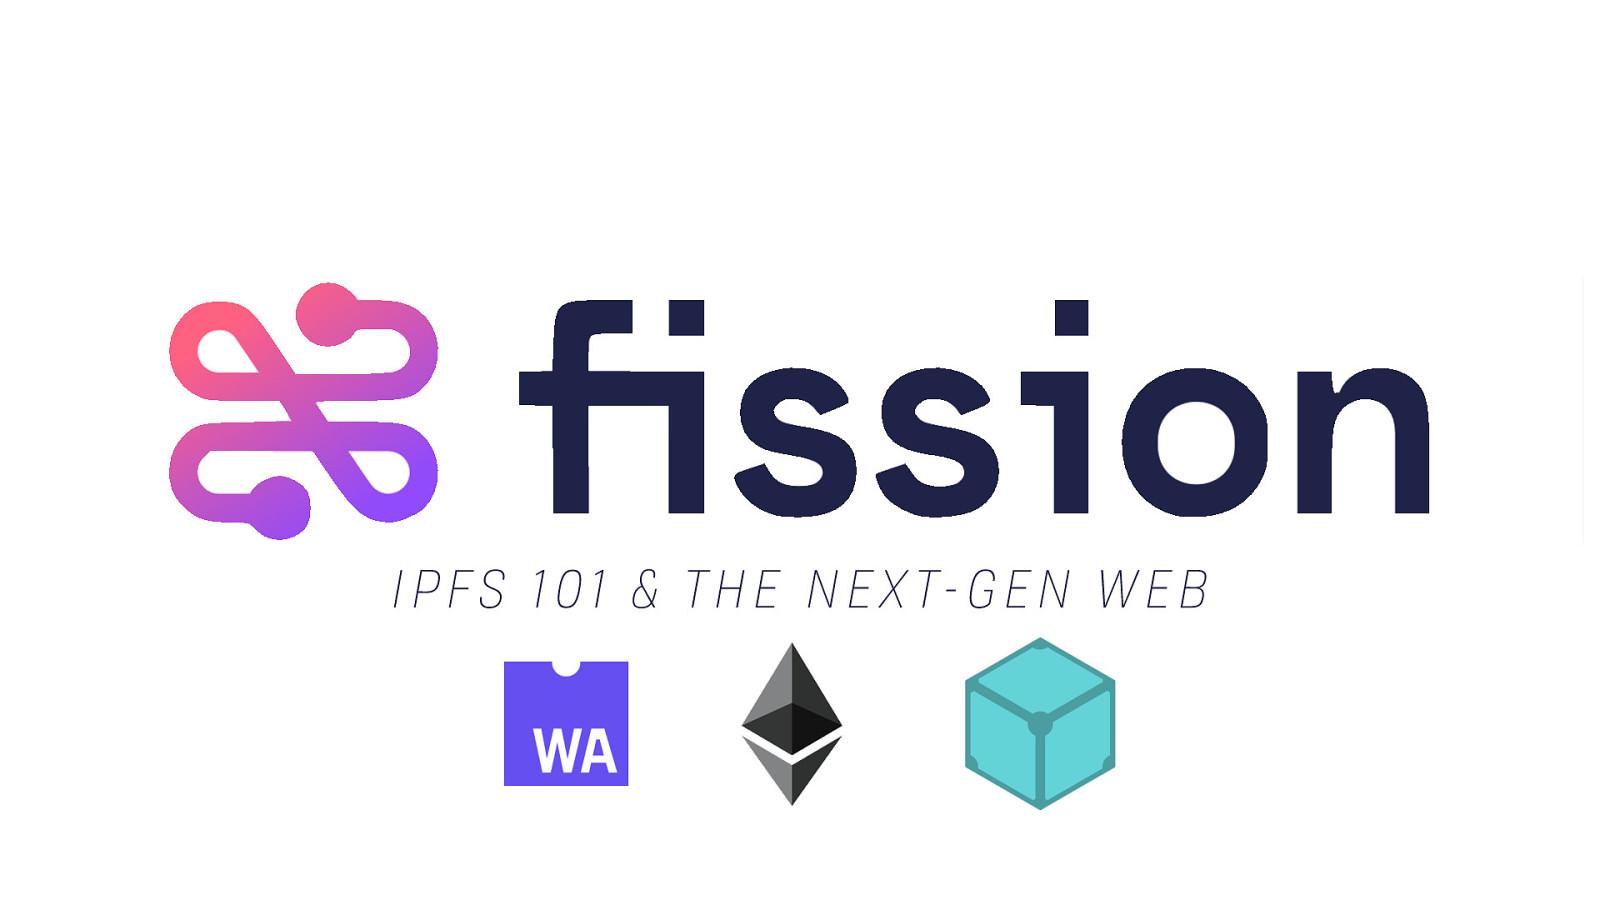 IPFS 101 & FISSION